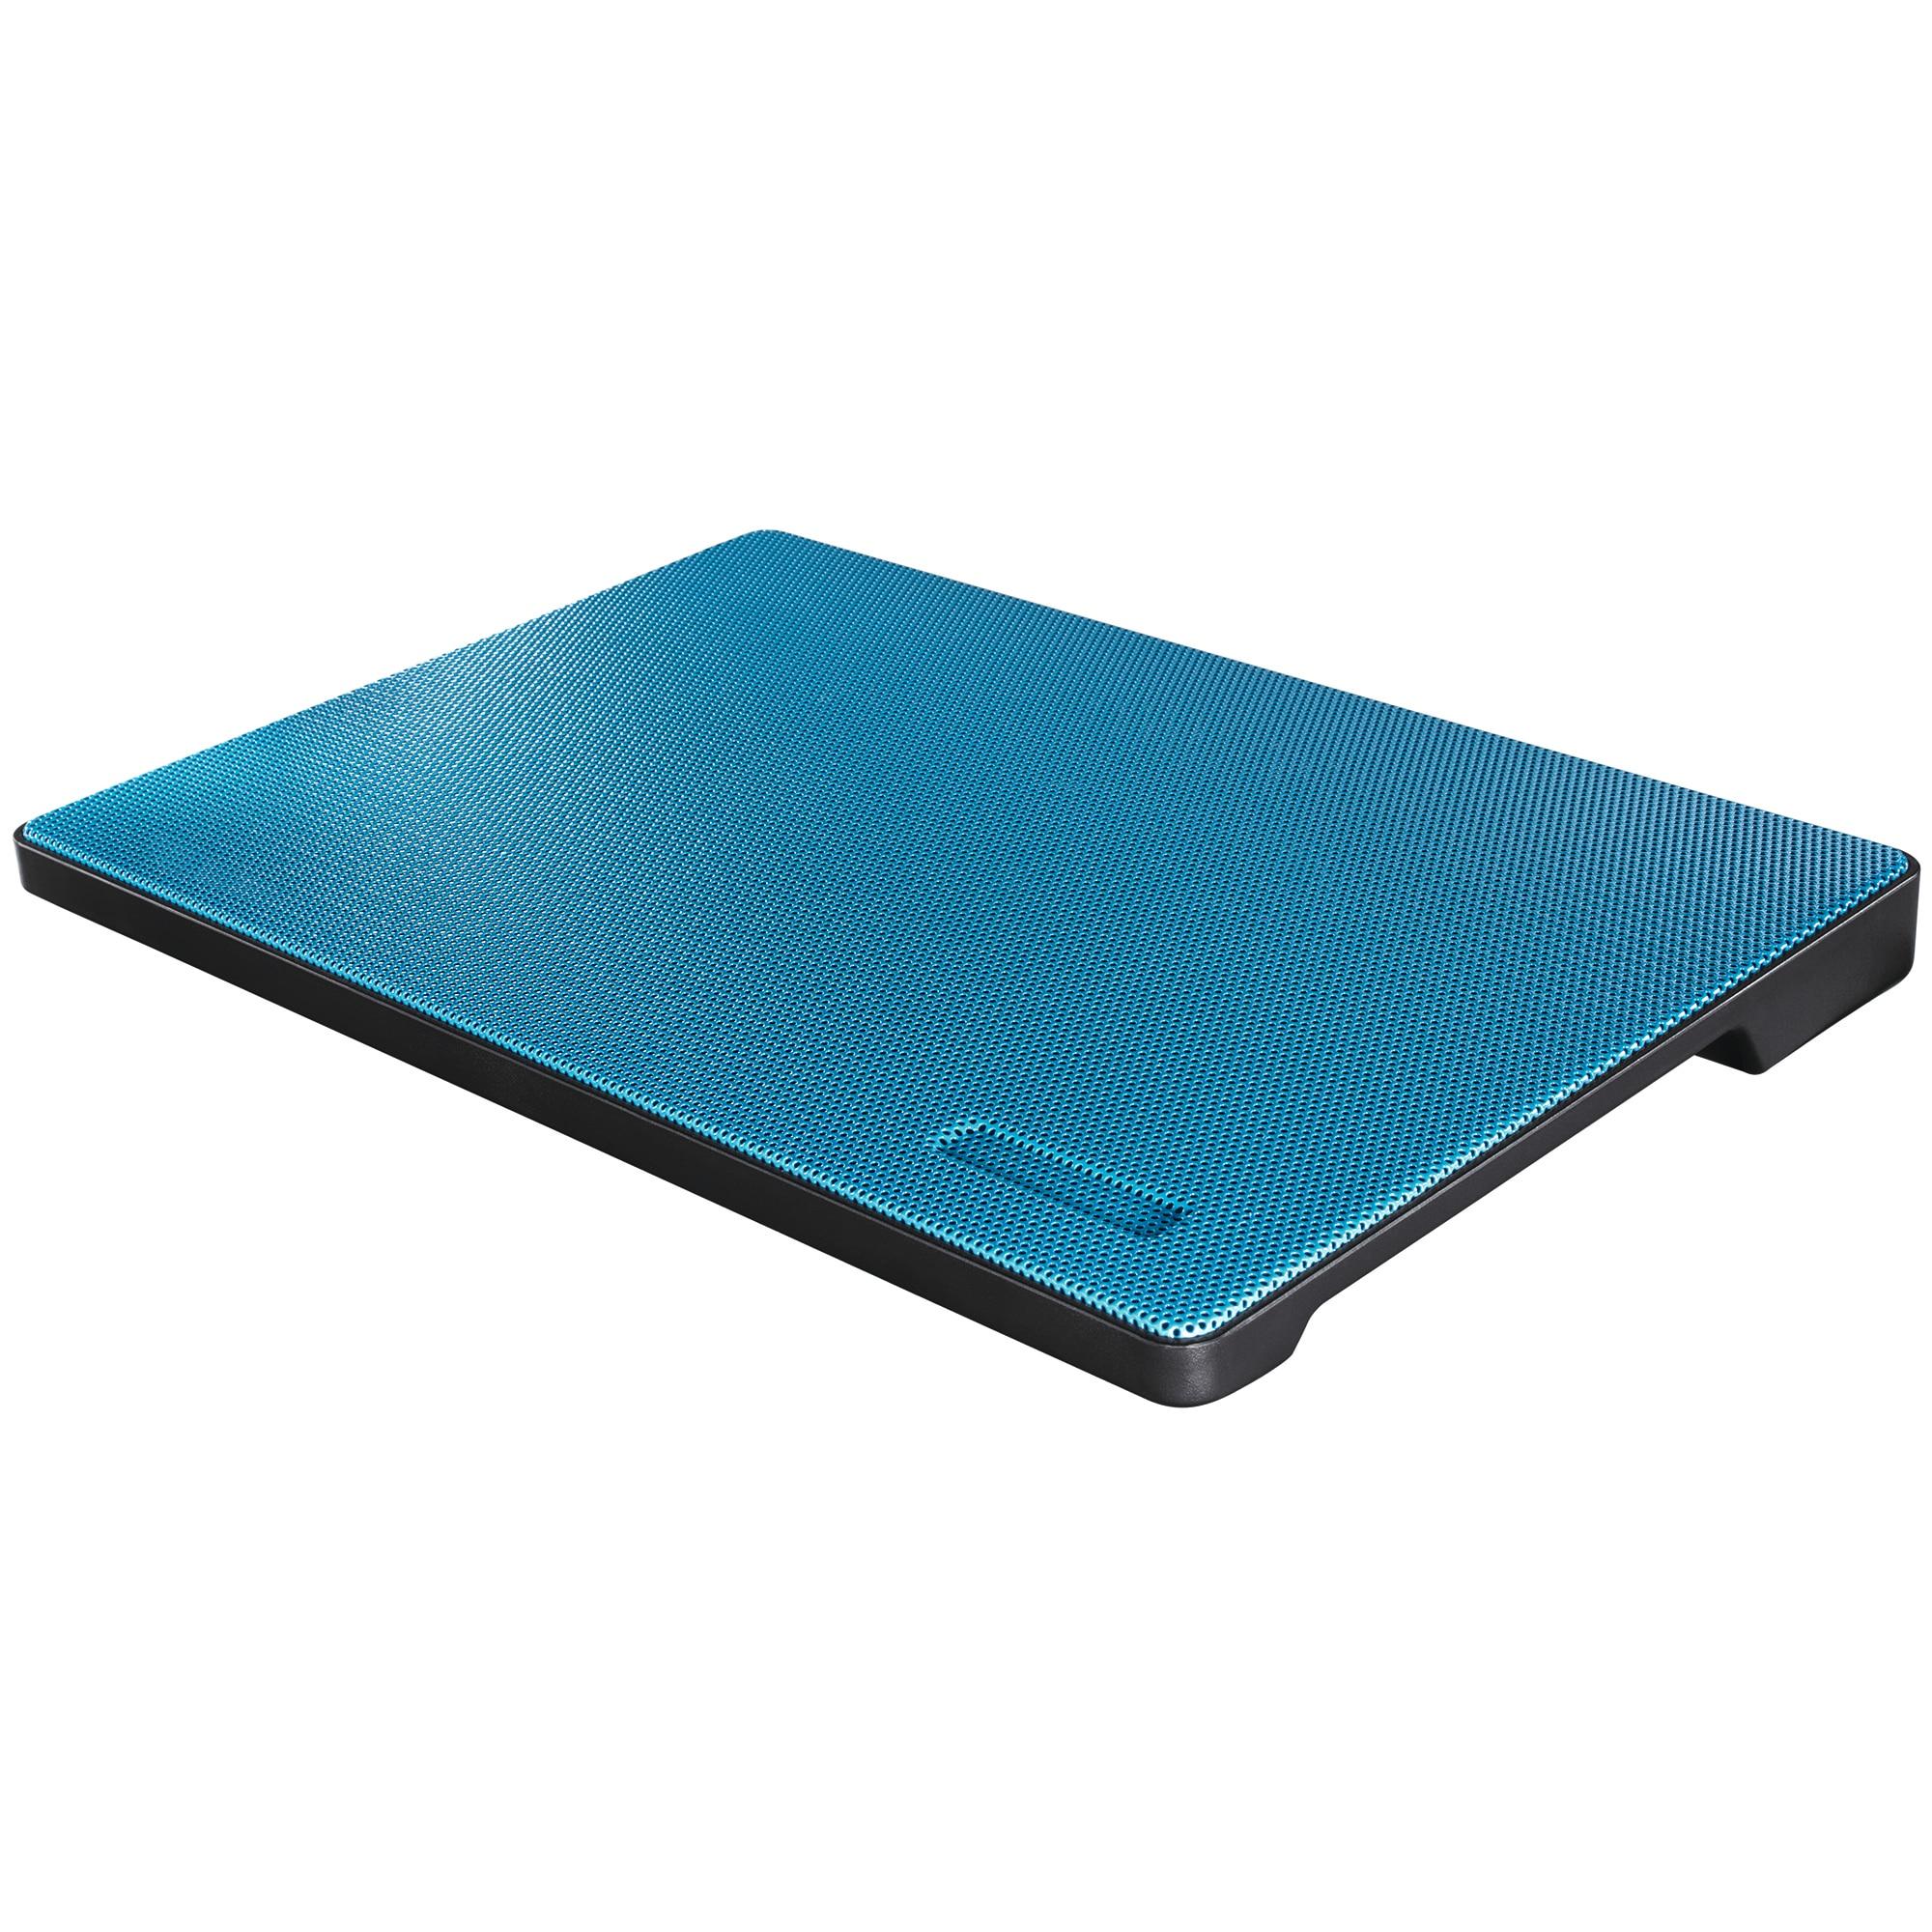 "Fotografie Cooler laptop Hama 53069 Slim, 13.3"" - 15.6"", USB, Blue"